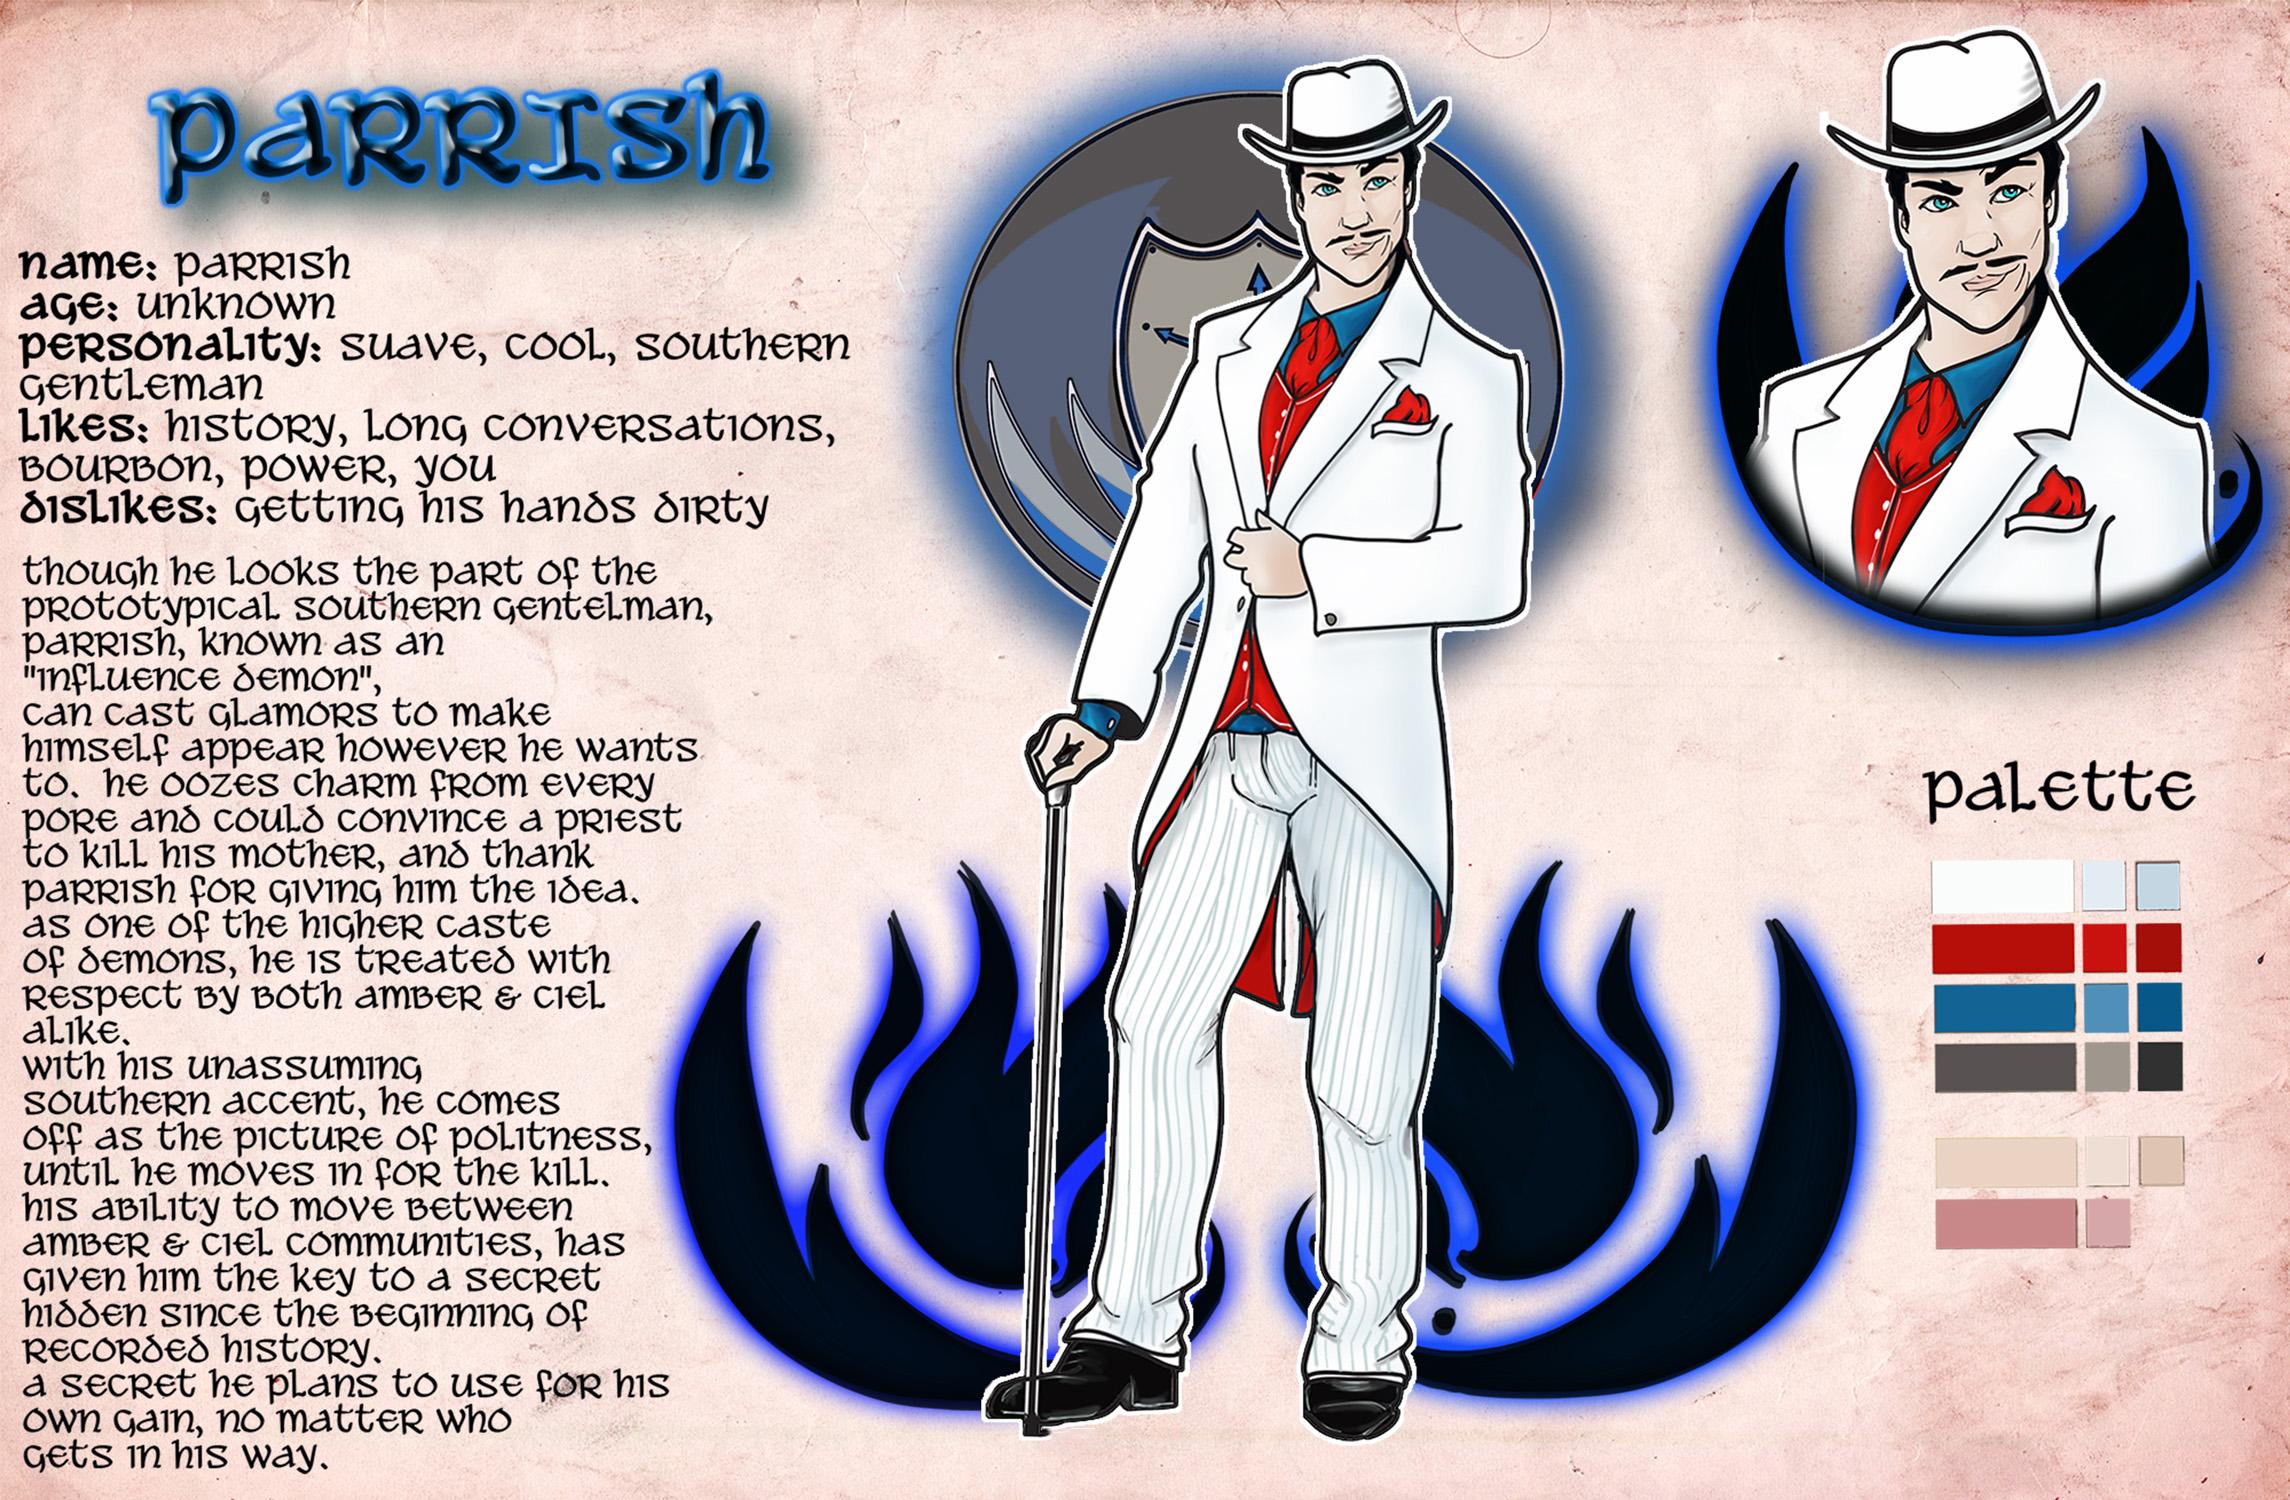 Parrish-new-character-card-webwhite.jpg